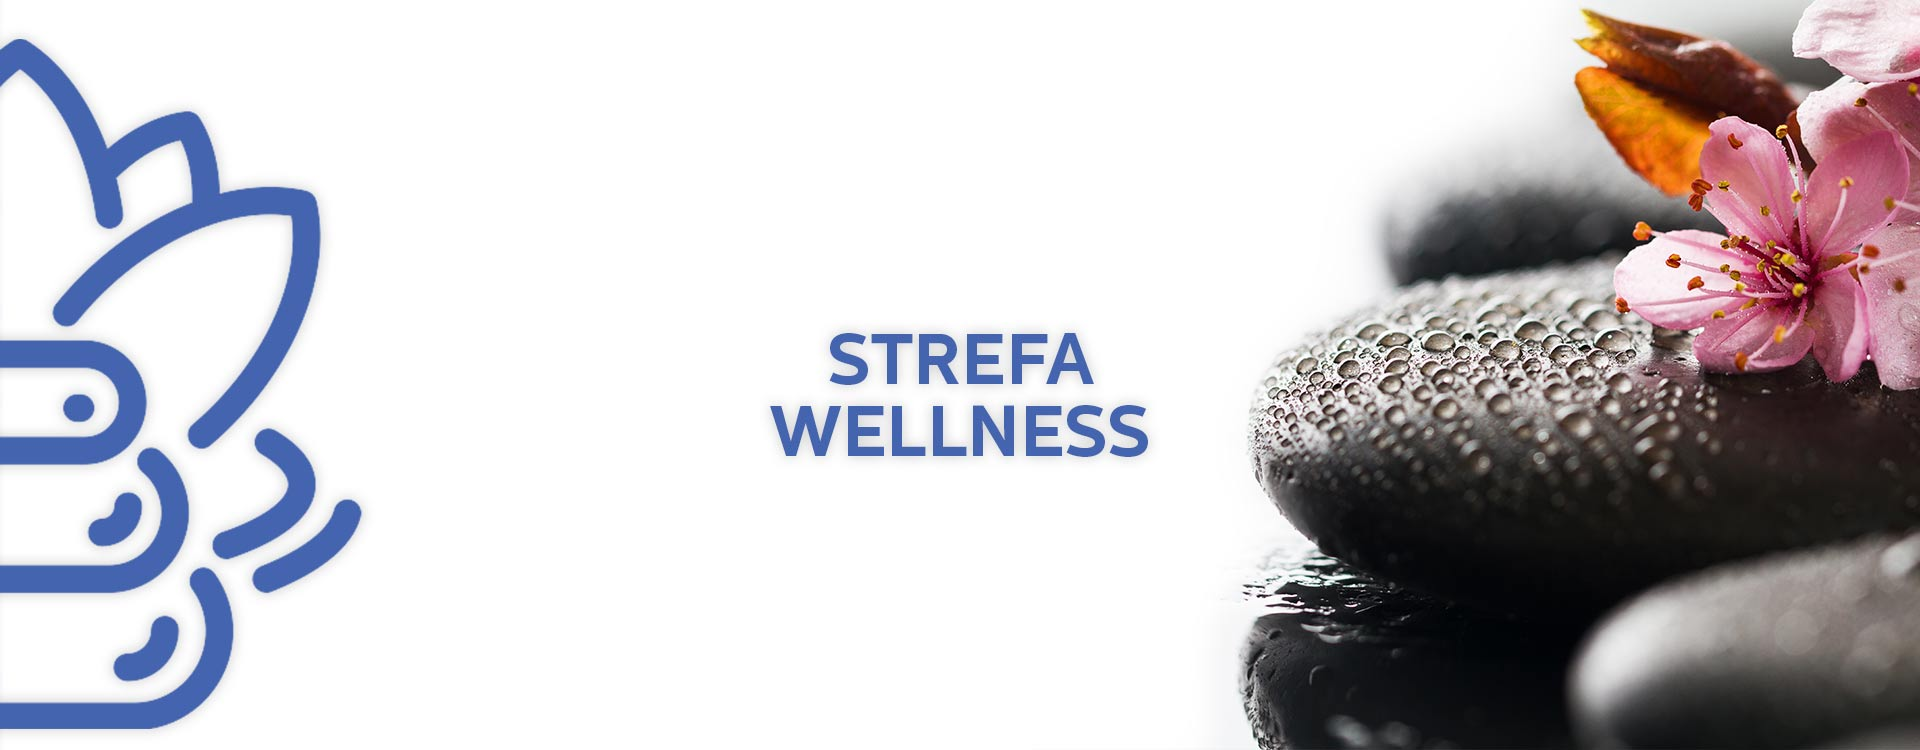 strefa_wellness